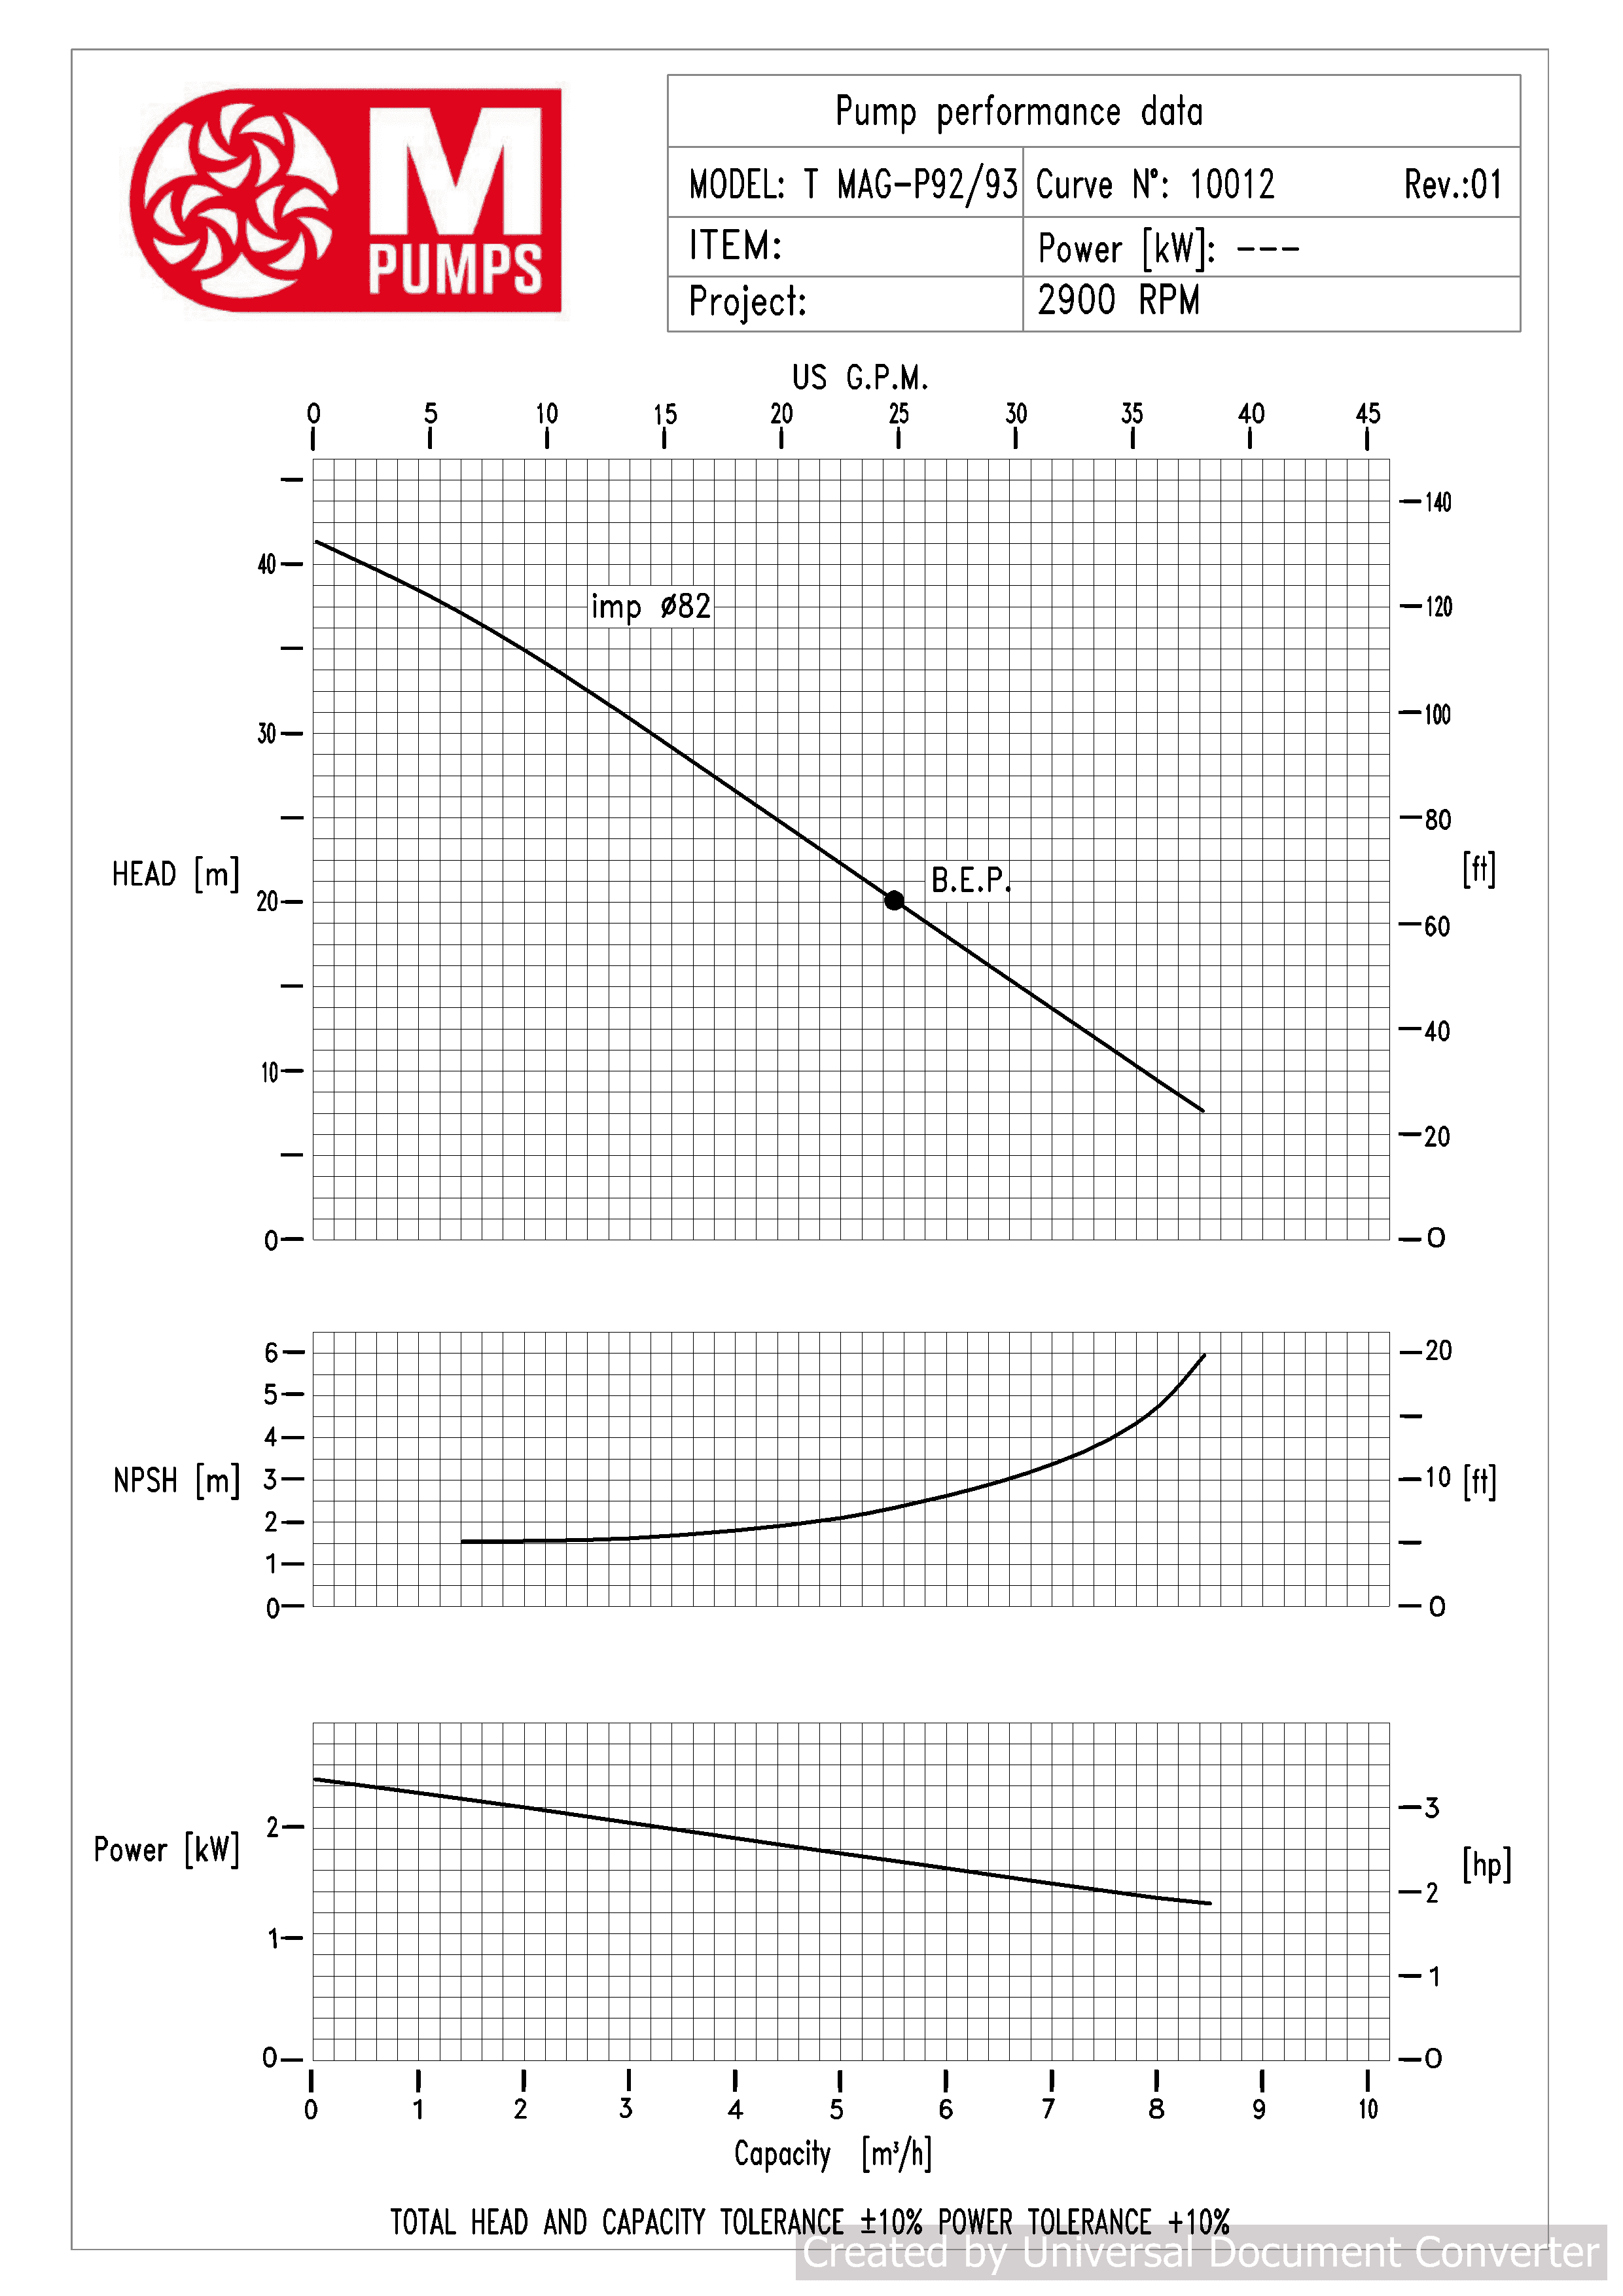 кривая t-mag-p-92